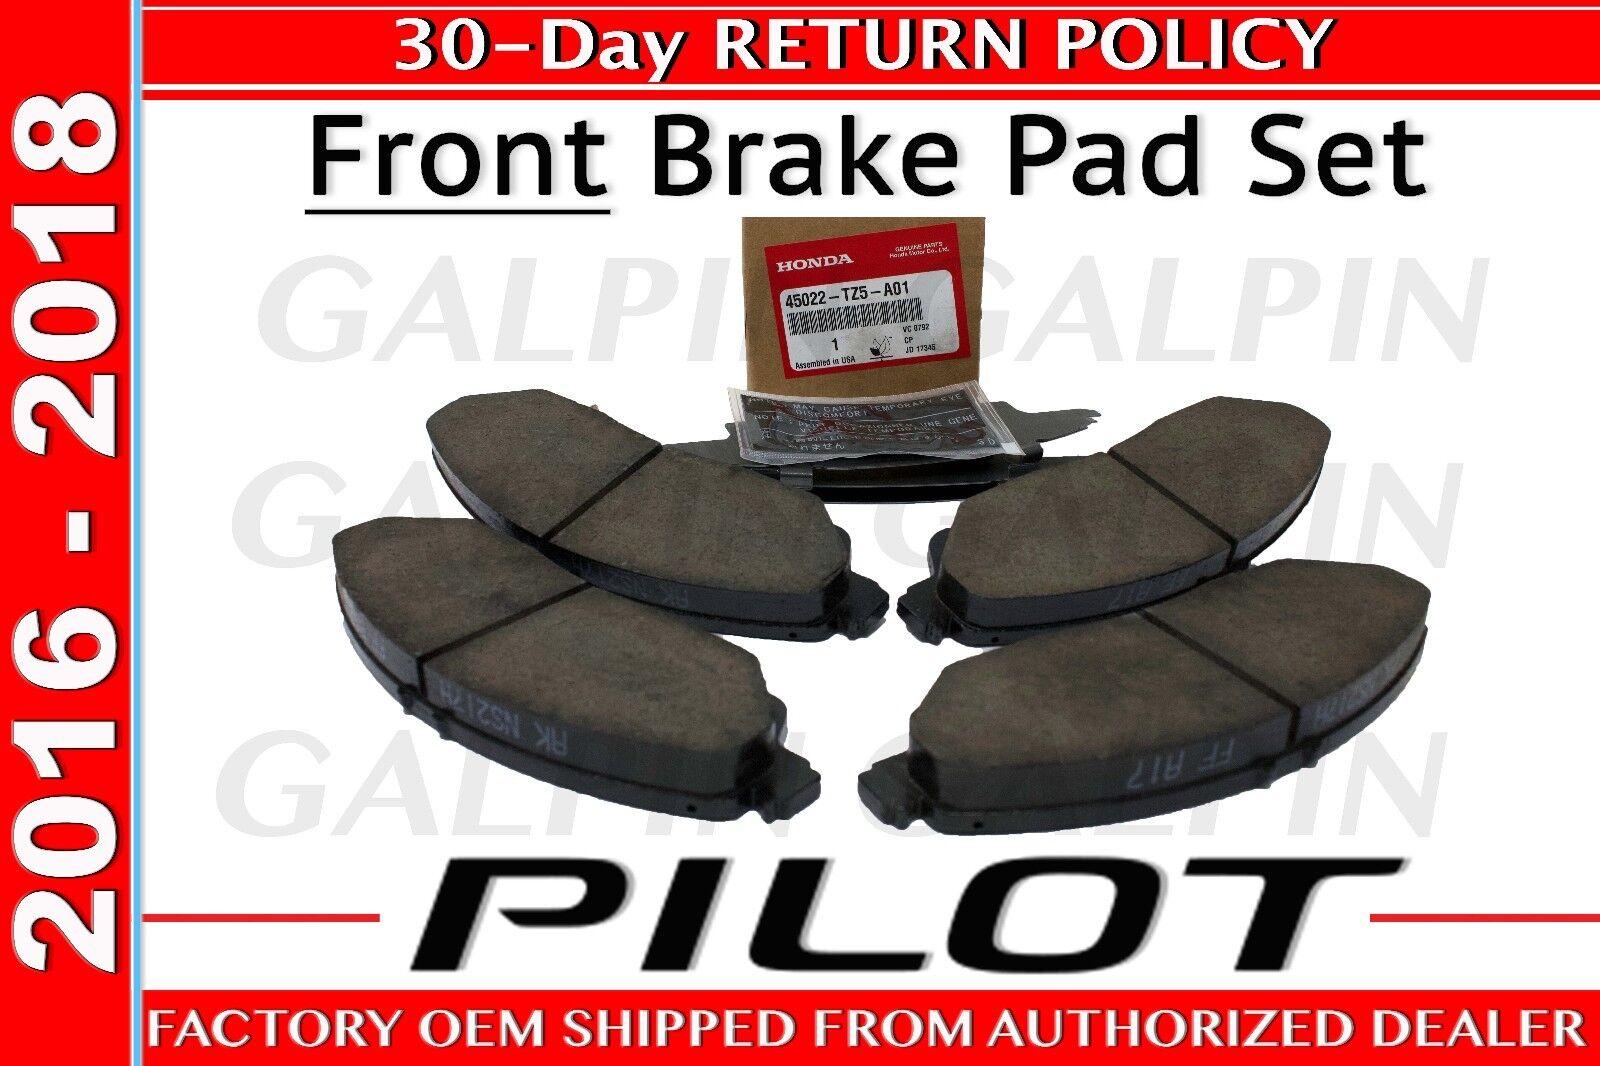 GENUINE Delphi Front Brake Pad Set LP2165 BRAND NEW 5 YEAR WARRANTY